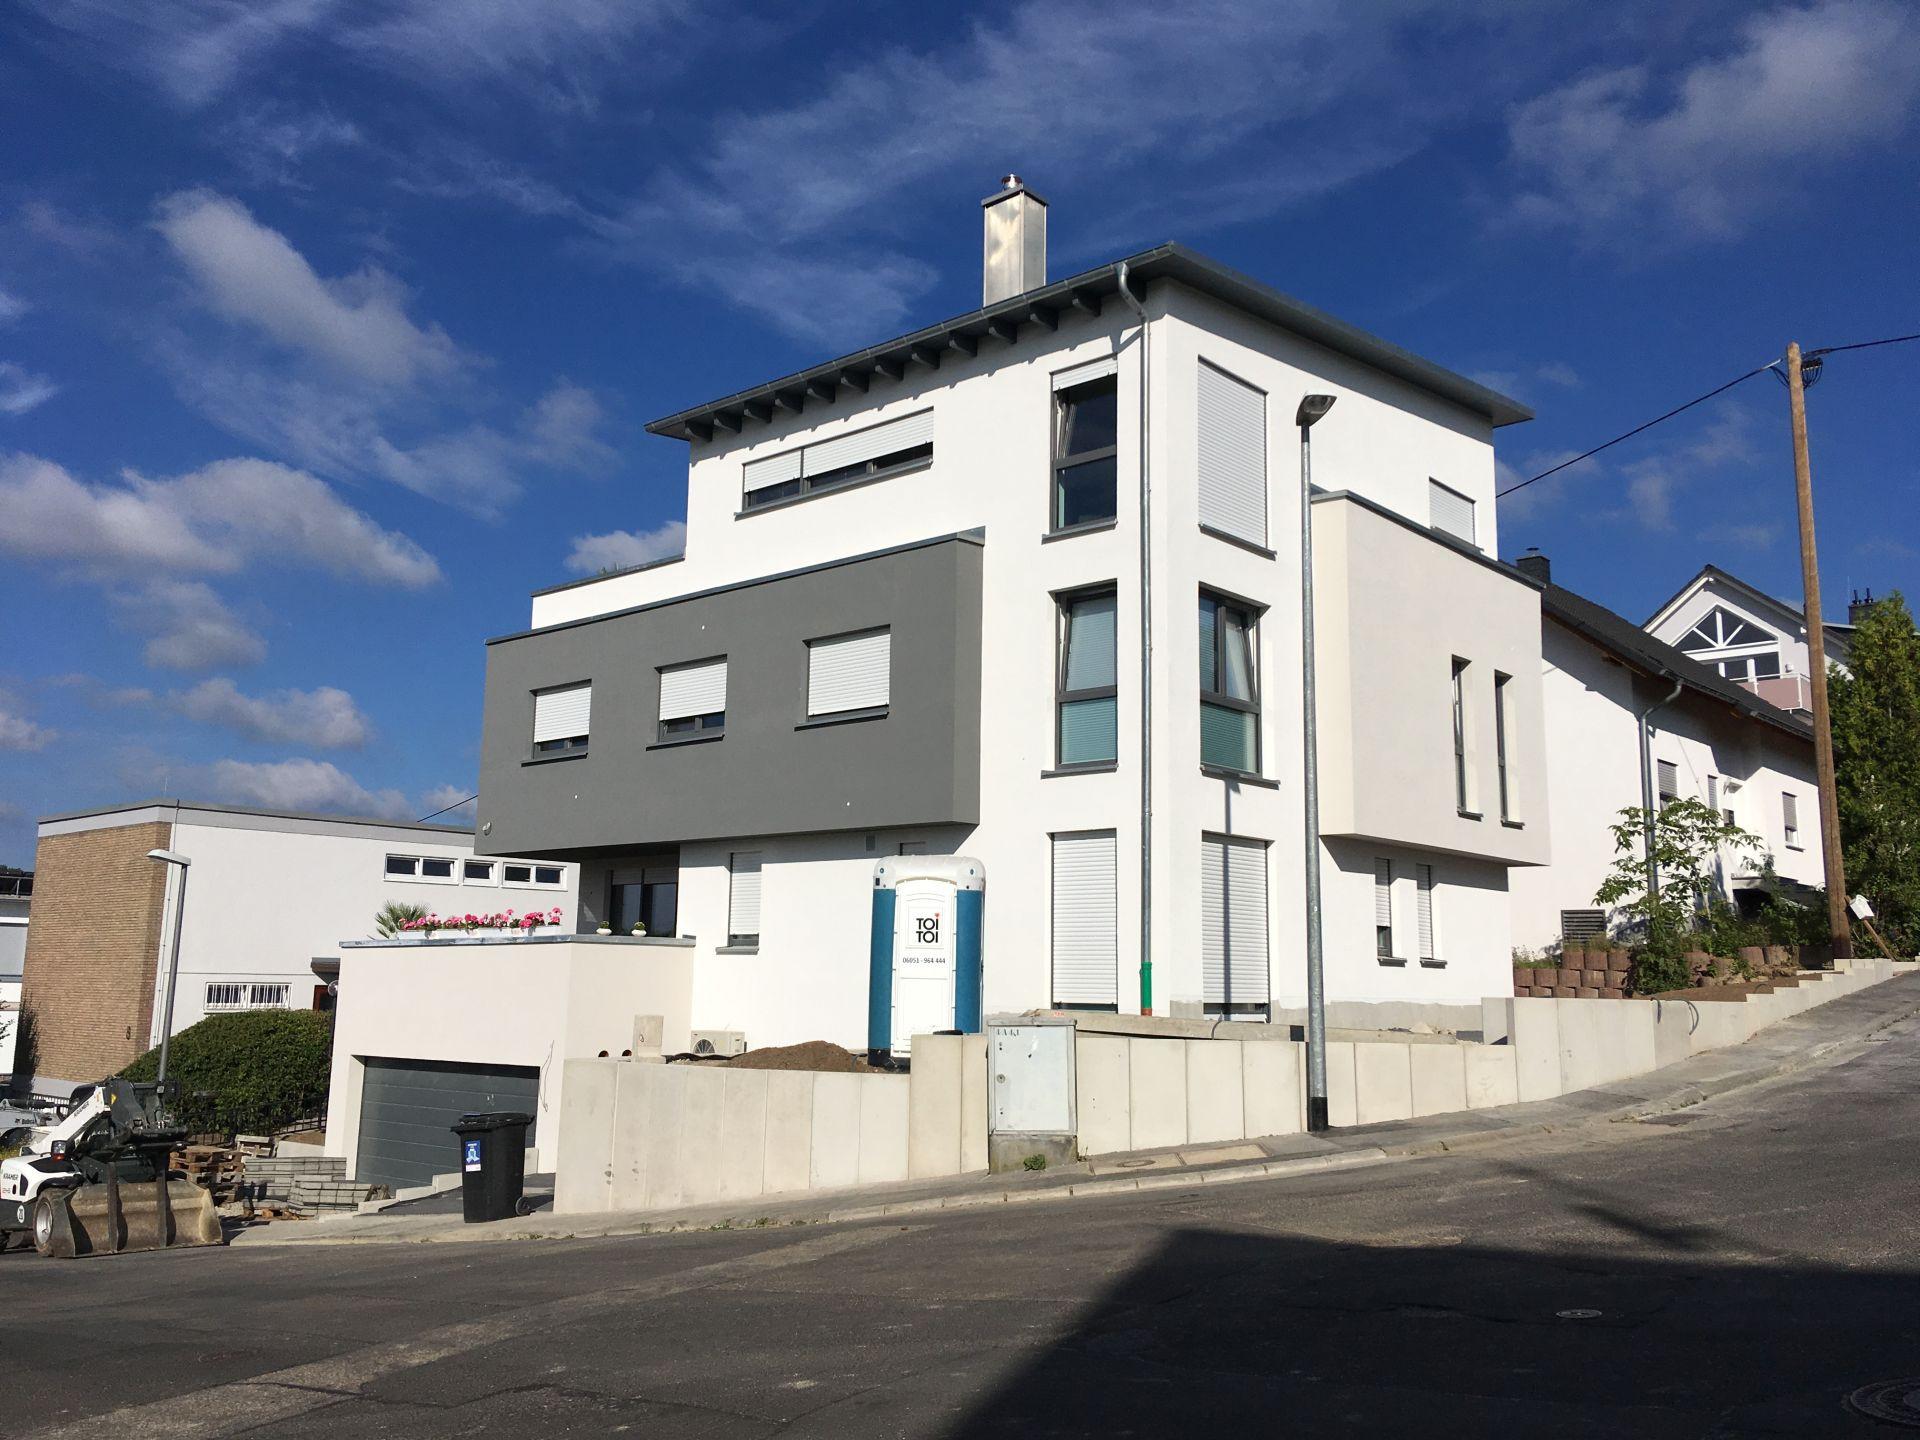 Haus 42 Wiesbaden  Wiesbaden Optihaus Fertighaus GmbH